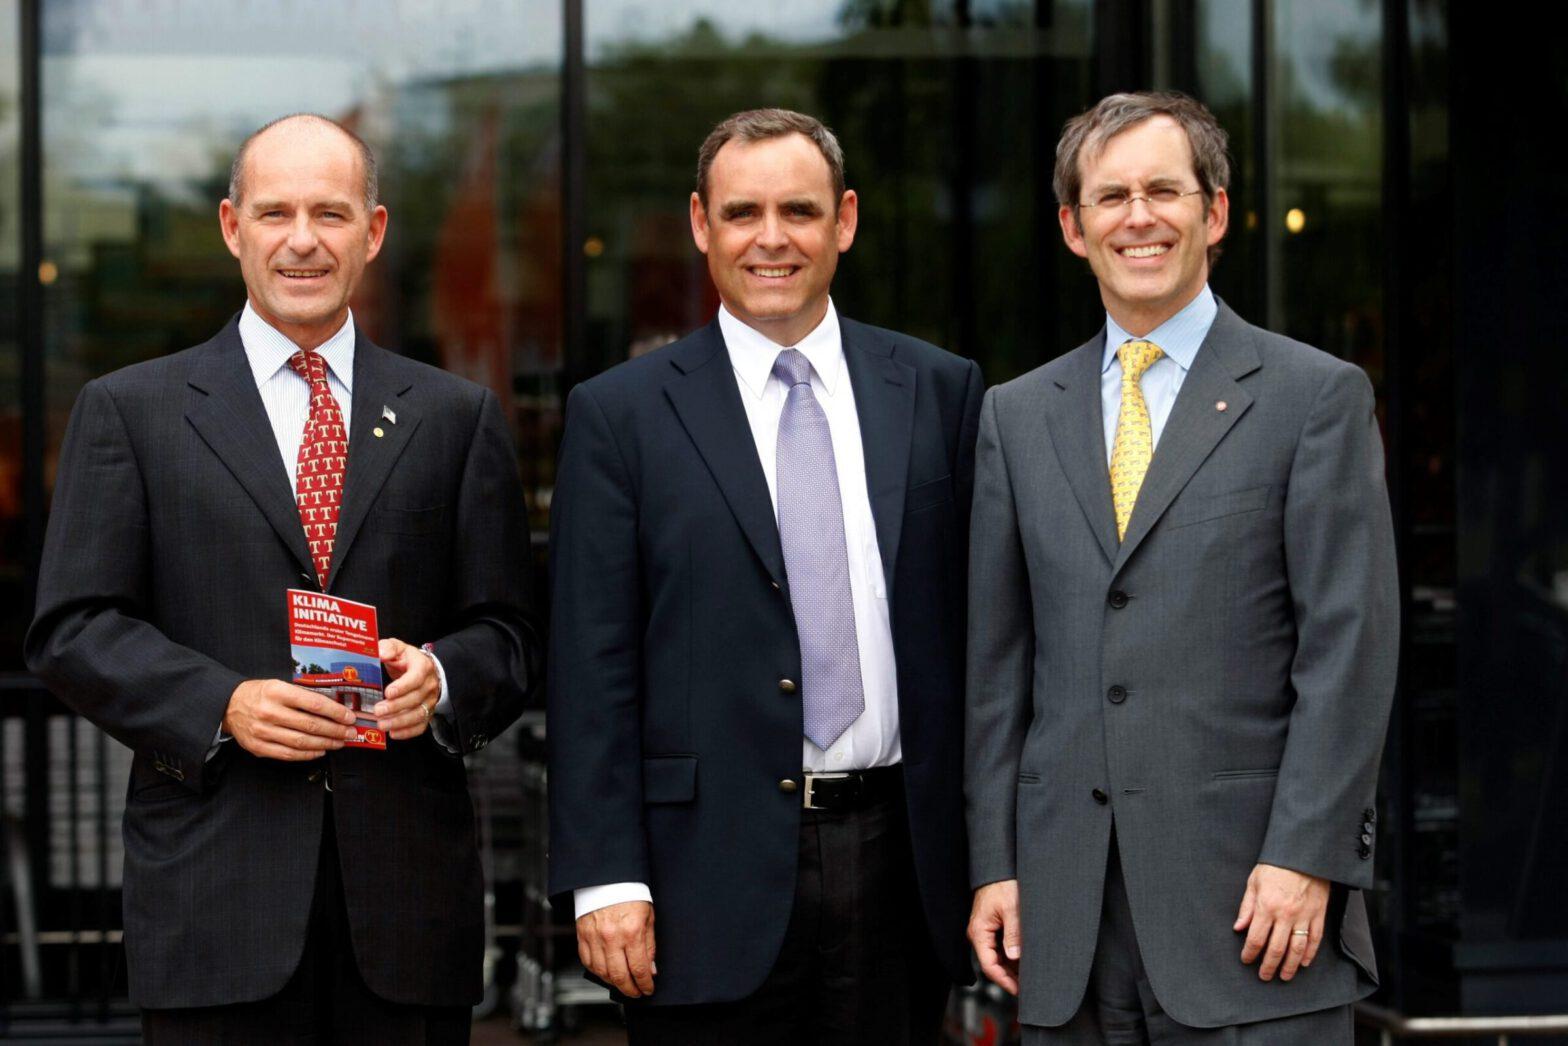 Karl-Erivan, Georg and Christian Haub